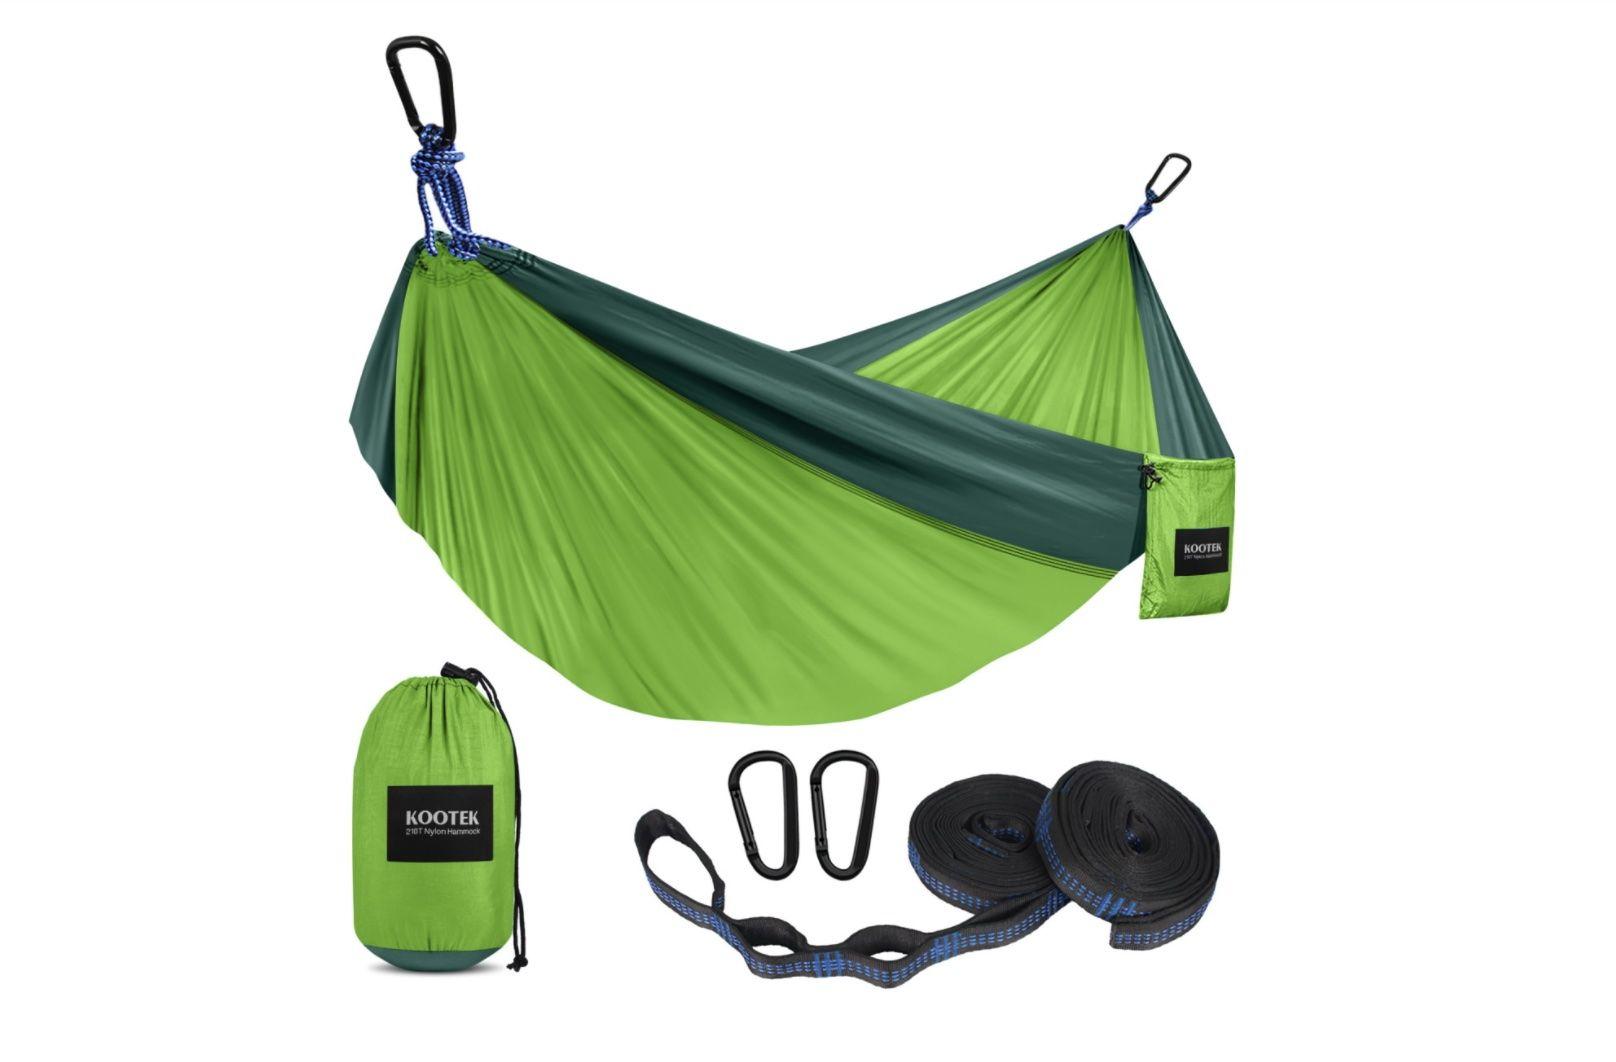 Fall camping gear Kootek Hammock